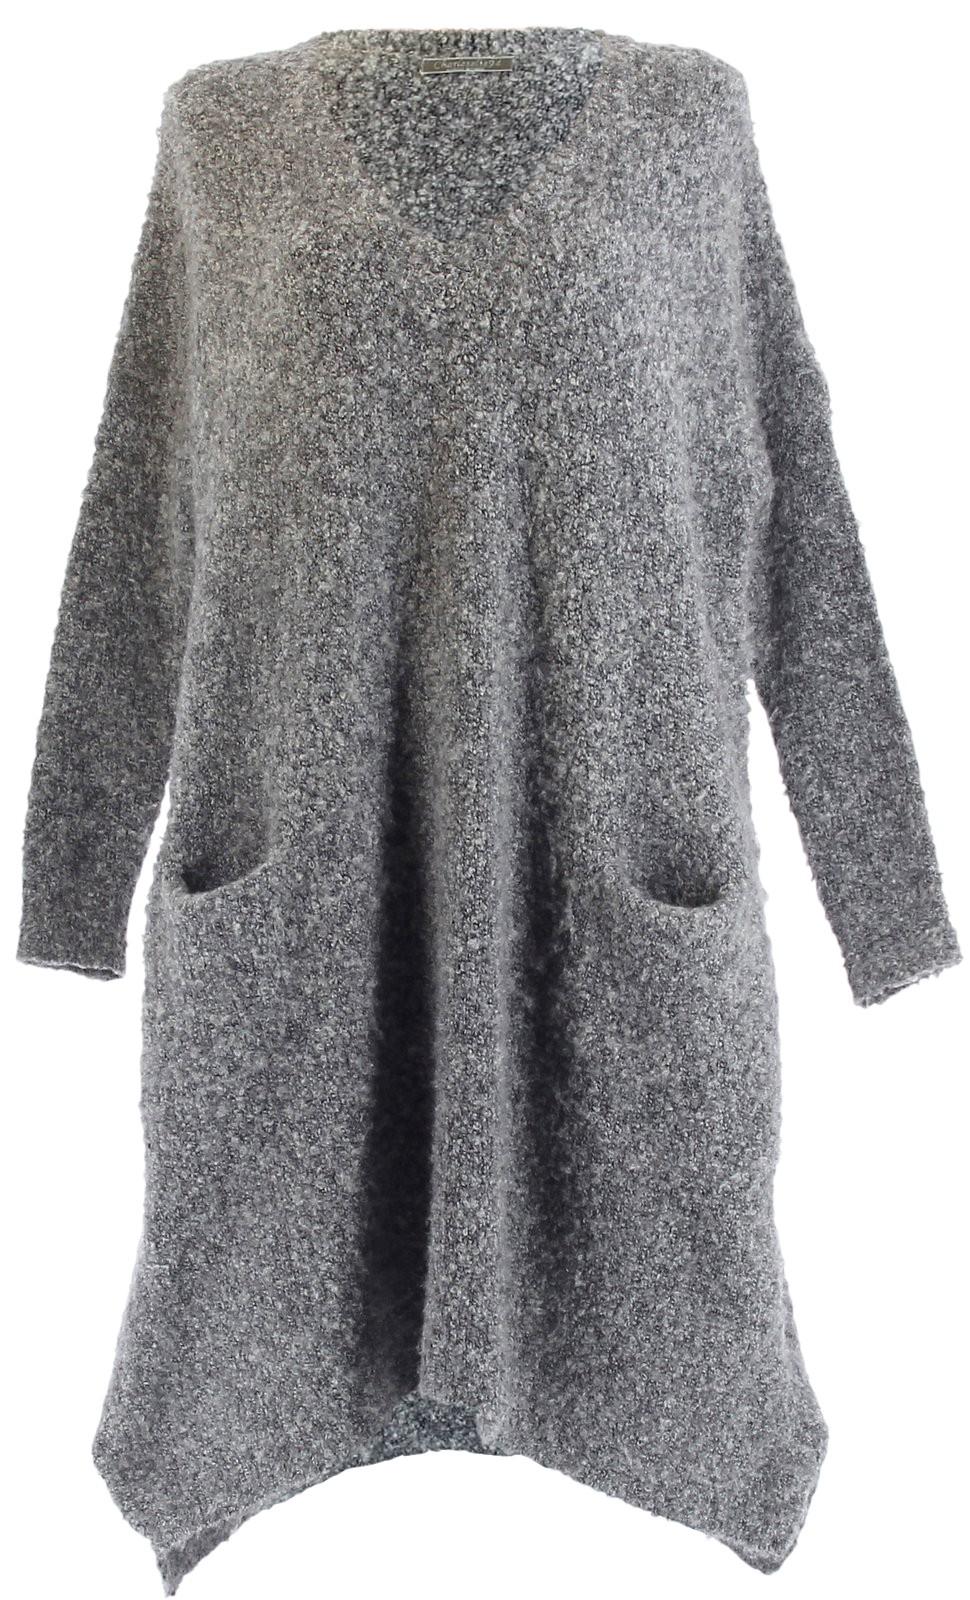 robe longue laine hiver fashion robes de france. Black Bedroom Furniture Sets. Home Design Ideas